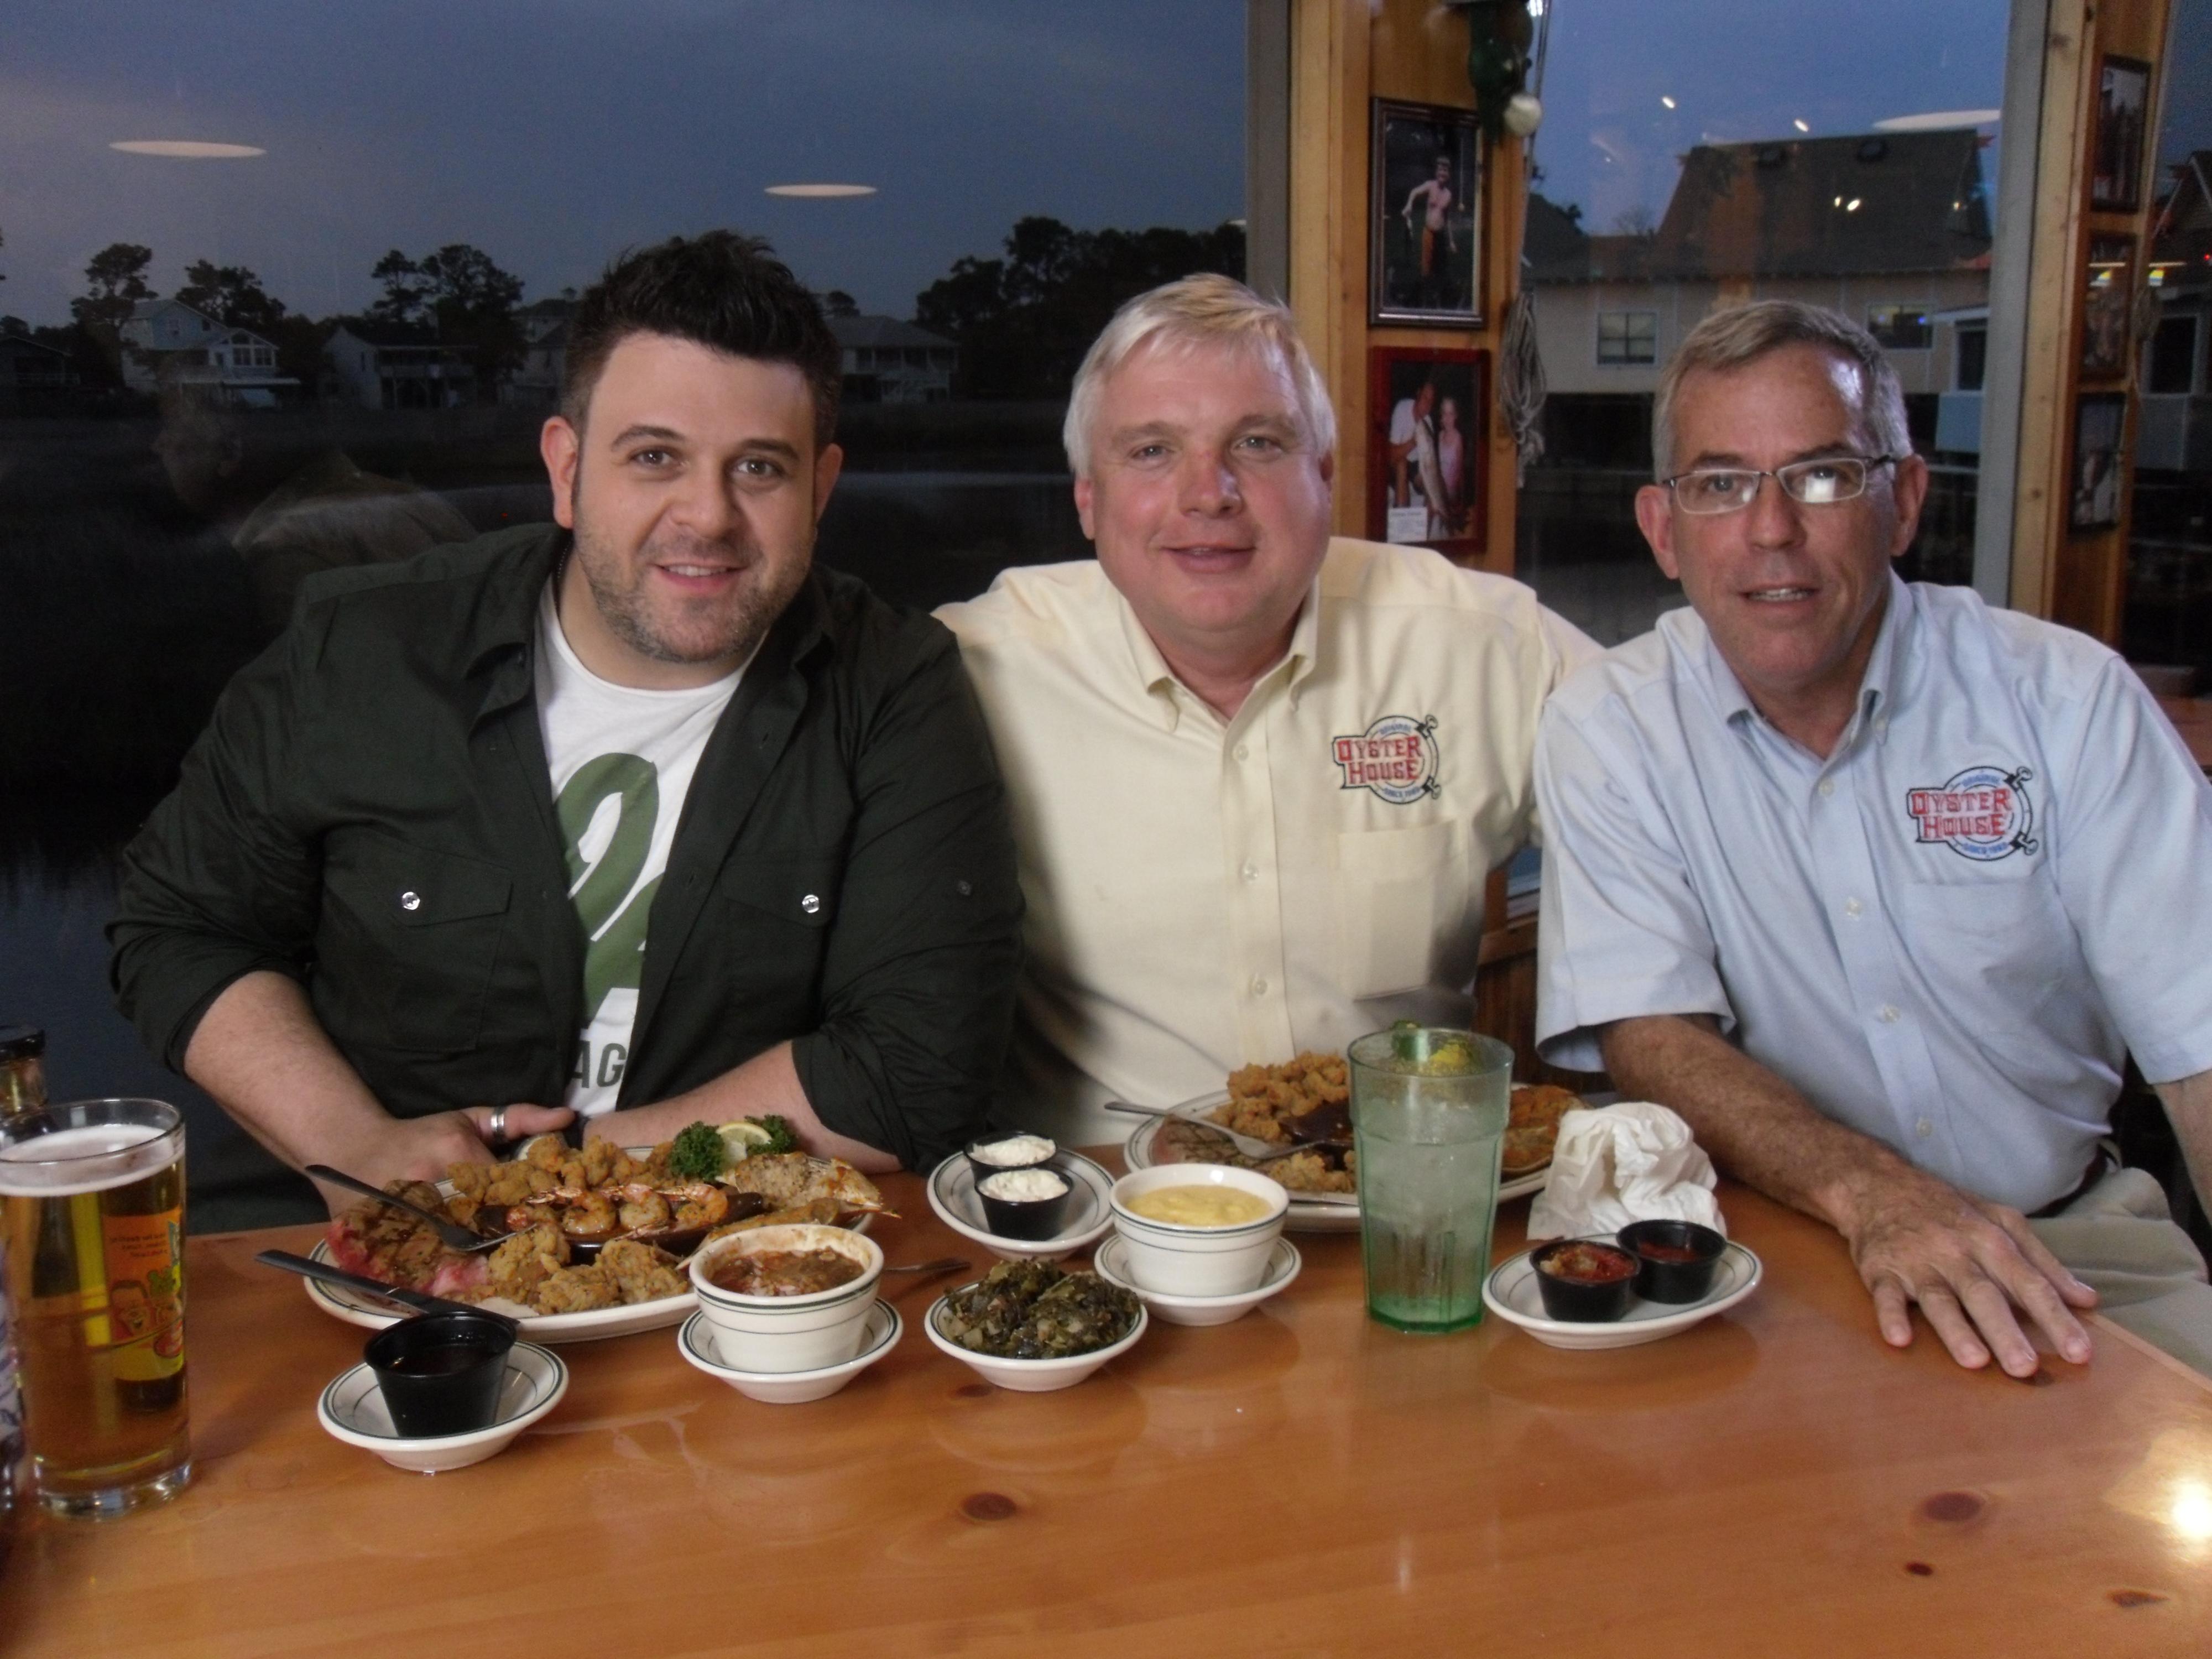 Adam Richman from Man vs. Food, American food reality television series, joins Original Oyster House founders Joe Roszkowski & David Dekle in creating a new menu item.